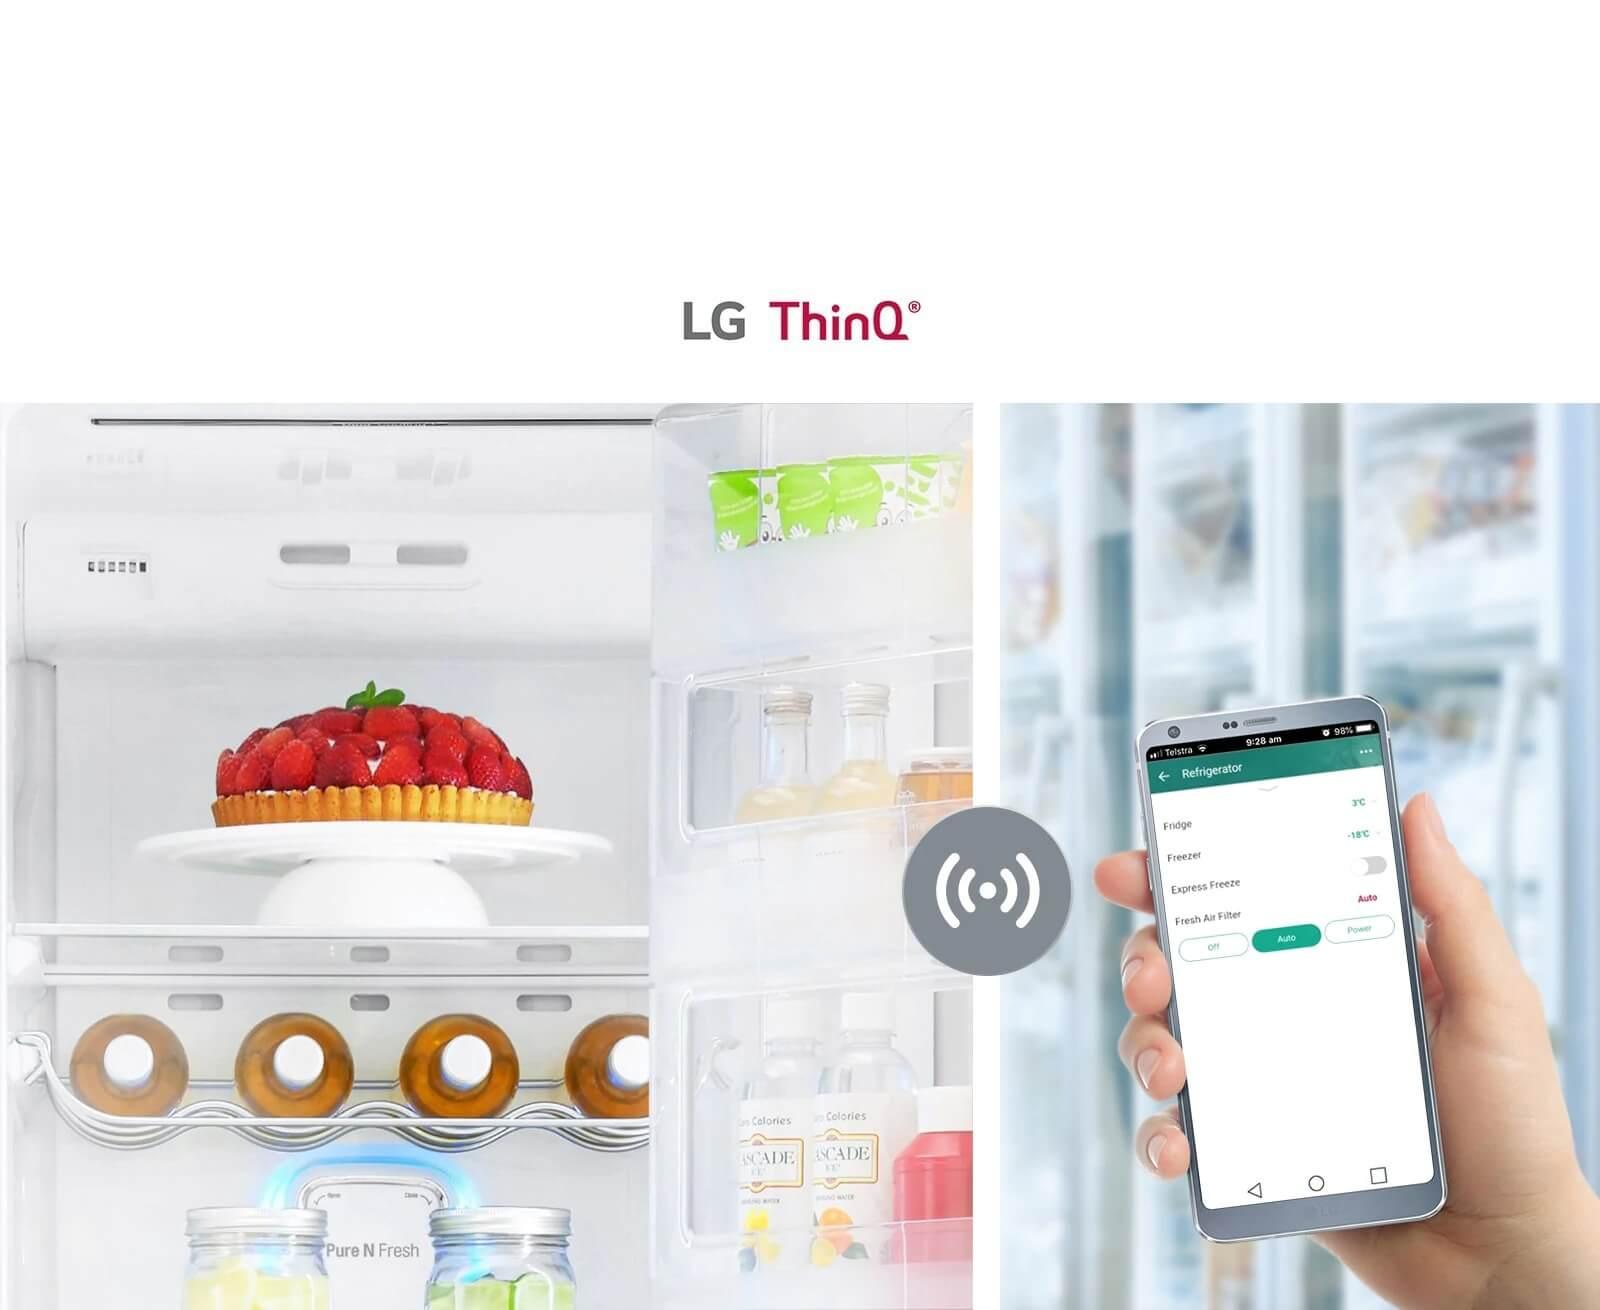 LG GC-X247CQBV Remotely Adjust Your Fridge Settings